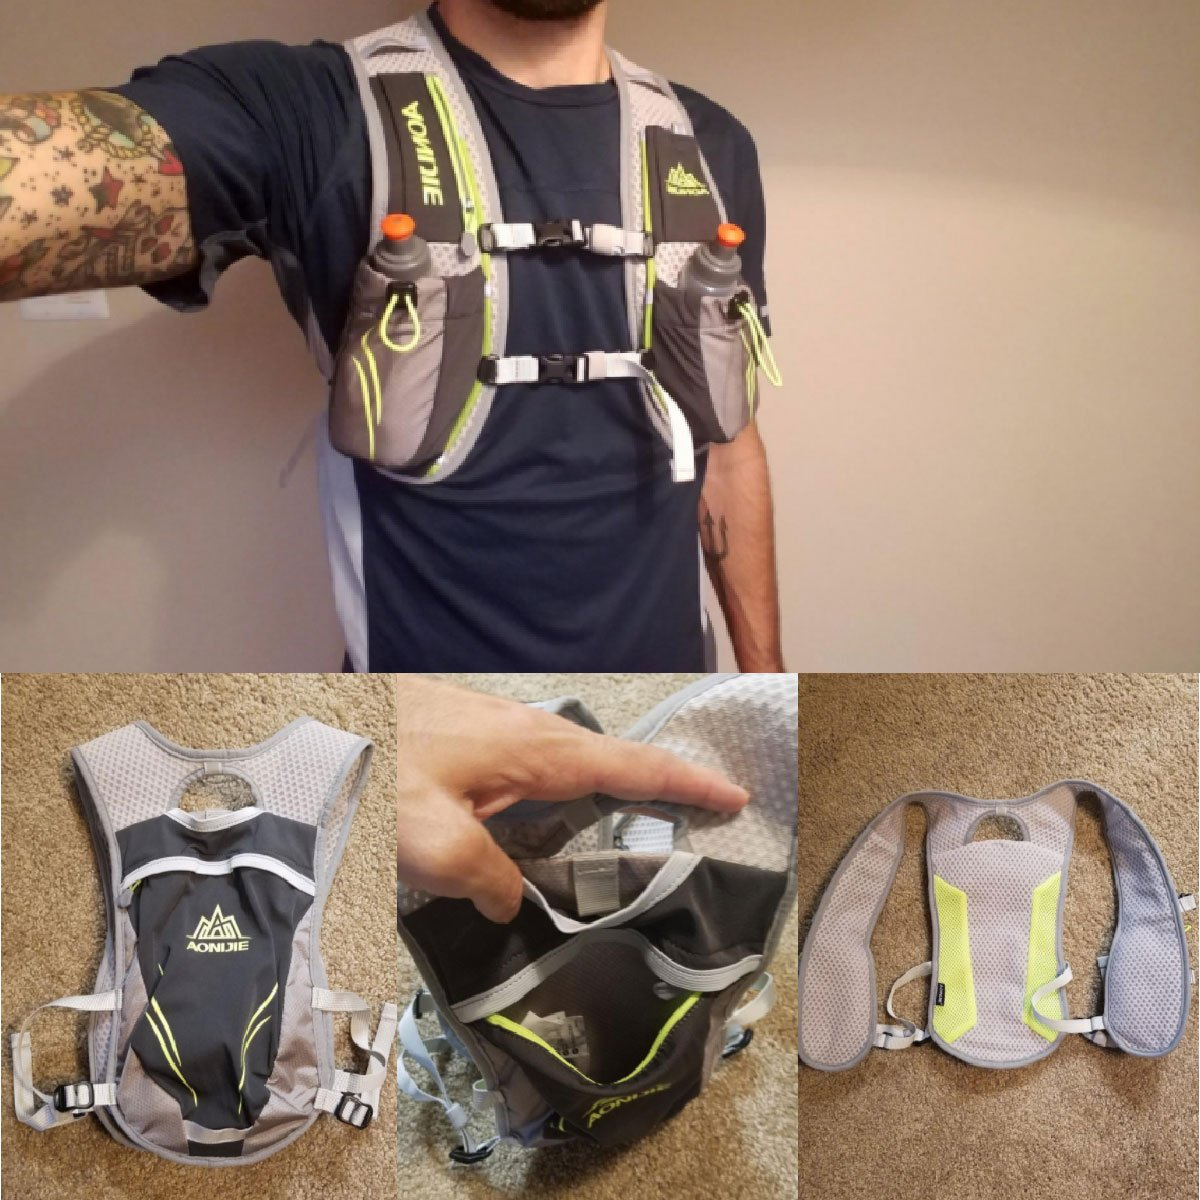 TRIWONDER Hydration Pack Backpack 5.5L Outdoors Mochilas Trail Marathoner Running Race Hydration Vest OS1508